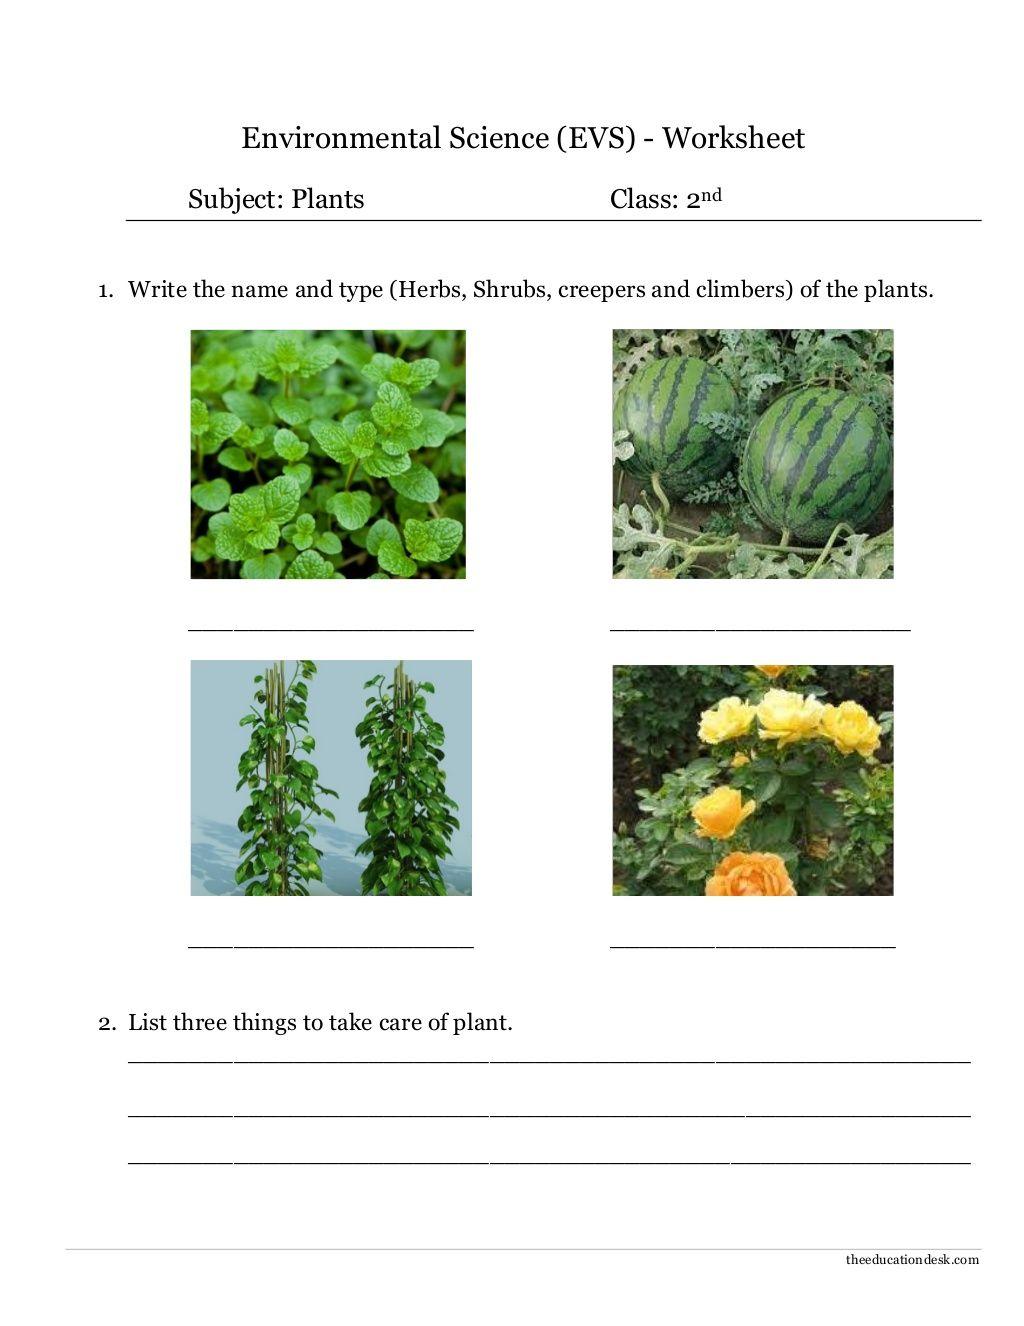 medium resolution of Environmental Science (EVS) : Plants Worksheet (Class II)   Plants  worksheets